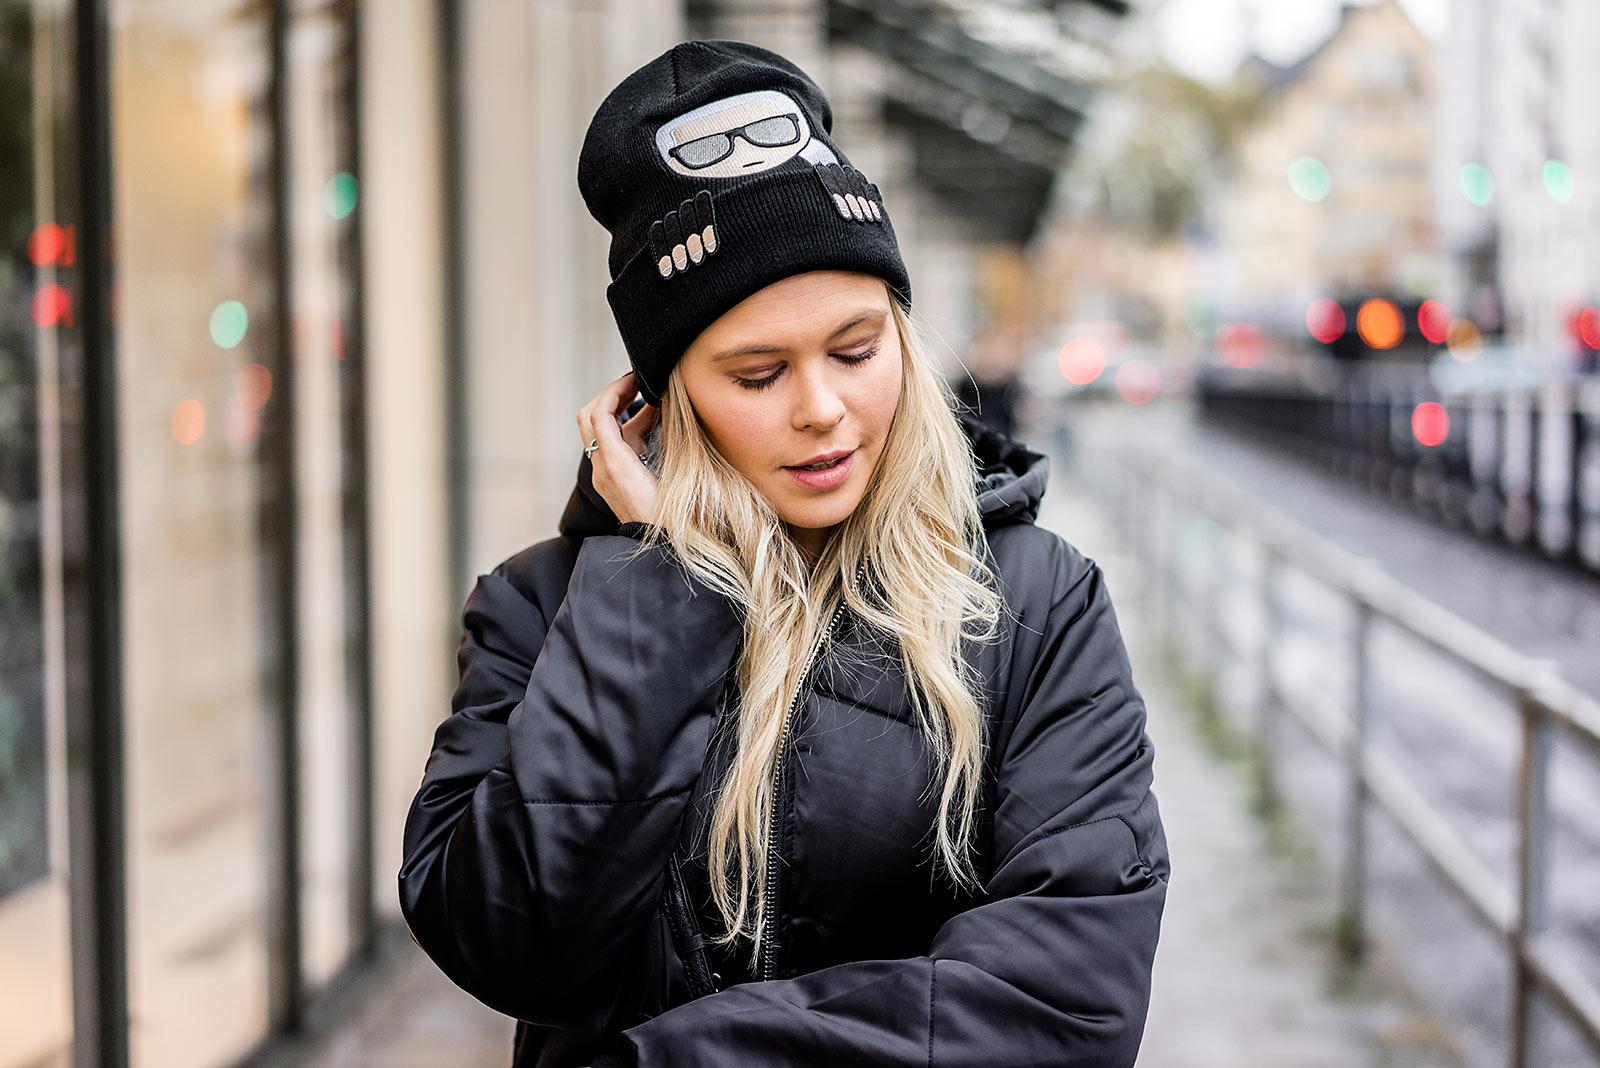 Karl Lagerfeld Mütze schwarz Outfit Winter Fashion Bloggerin Sunnyinga